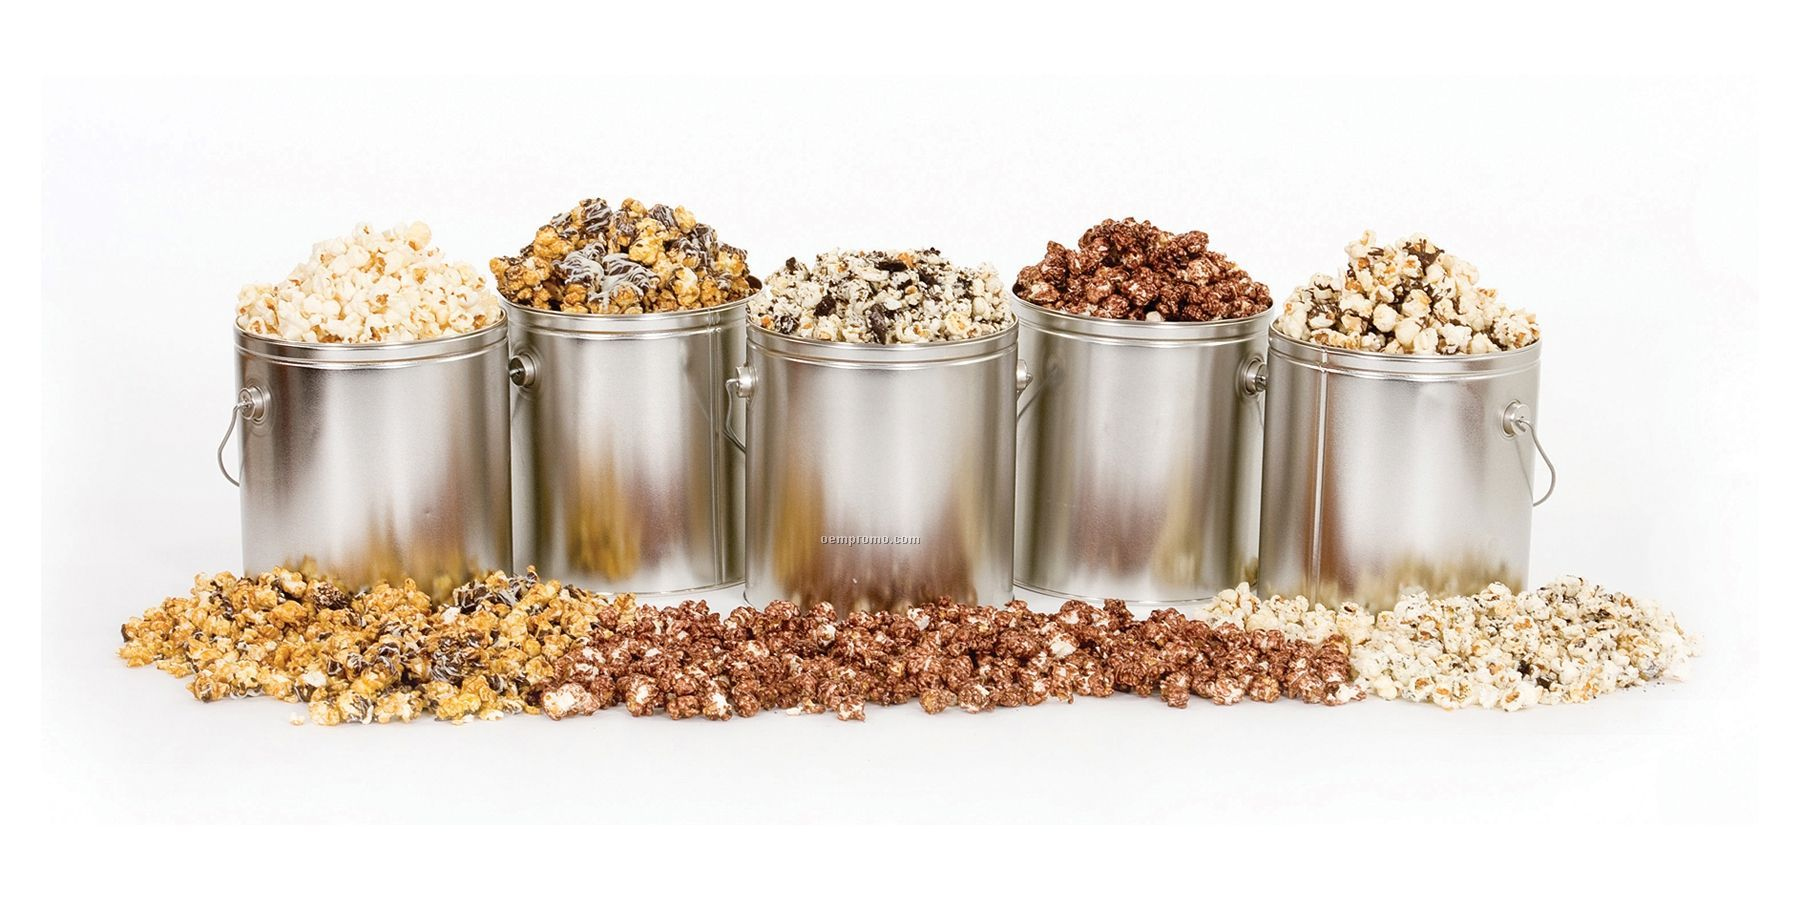 2 Gallon Kettle Corn Popcorn